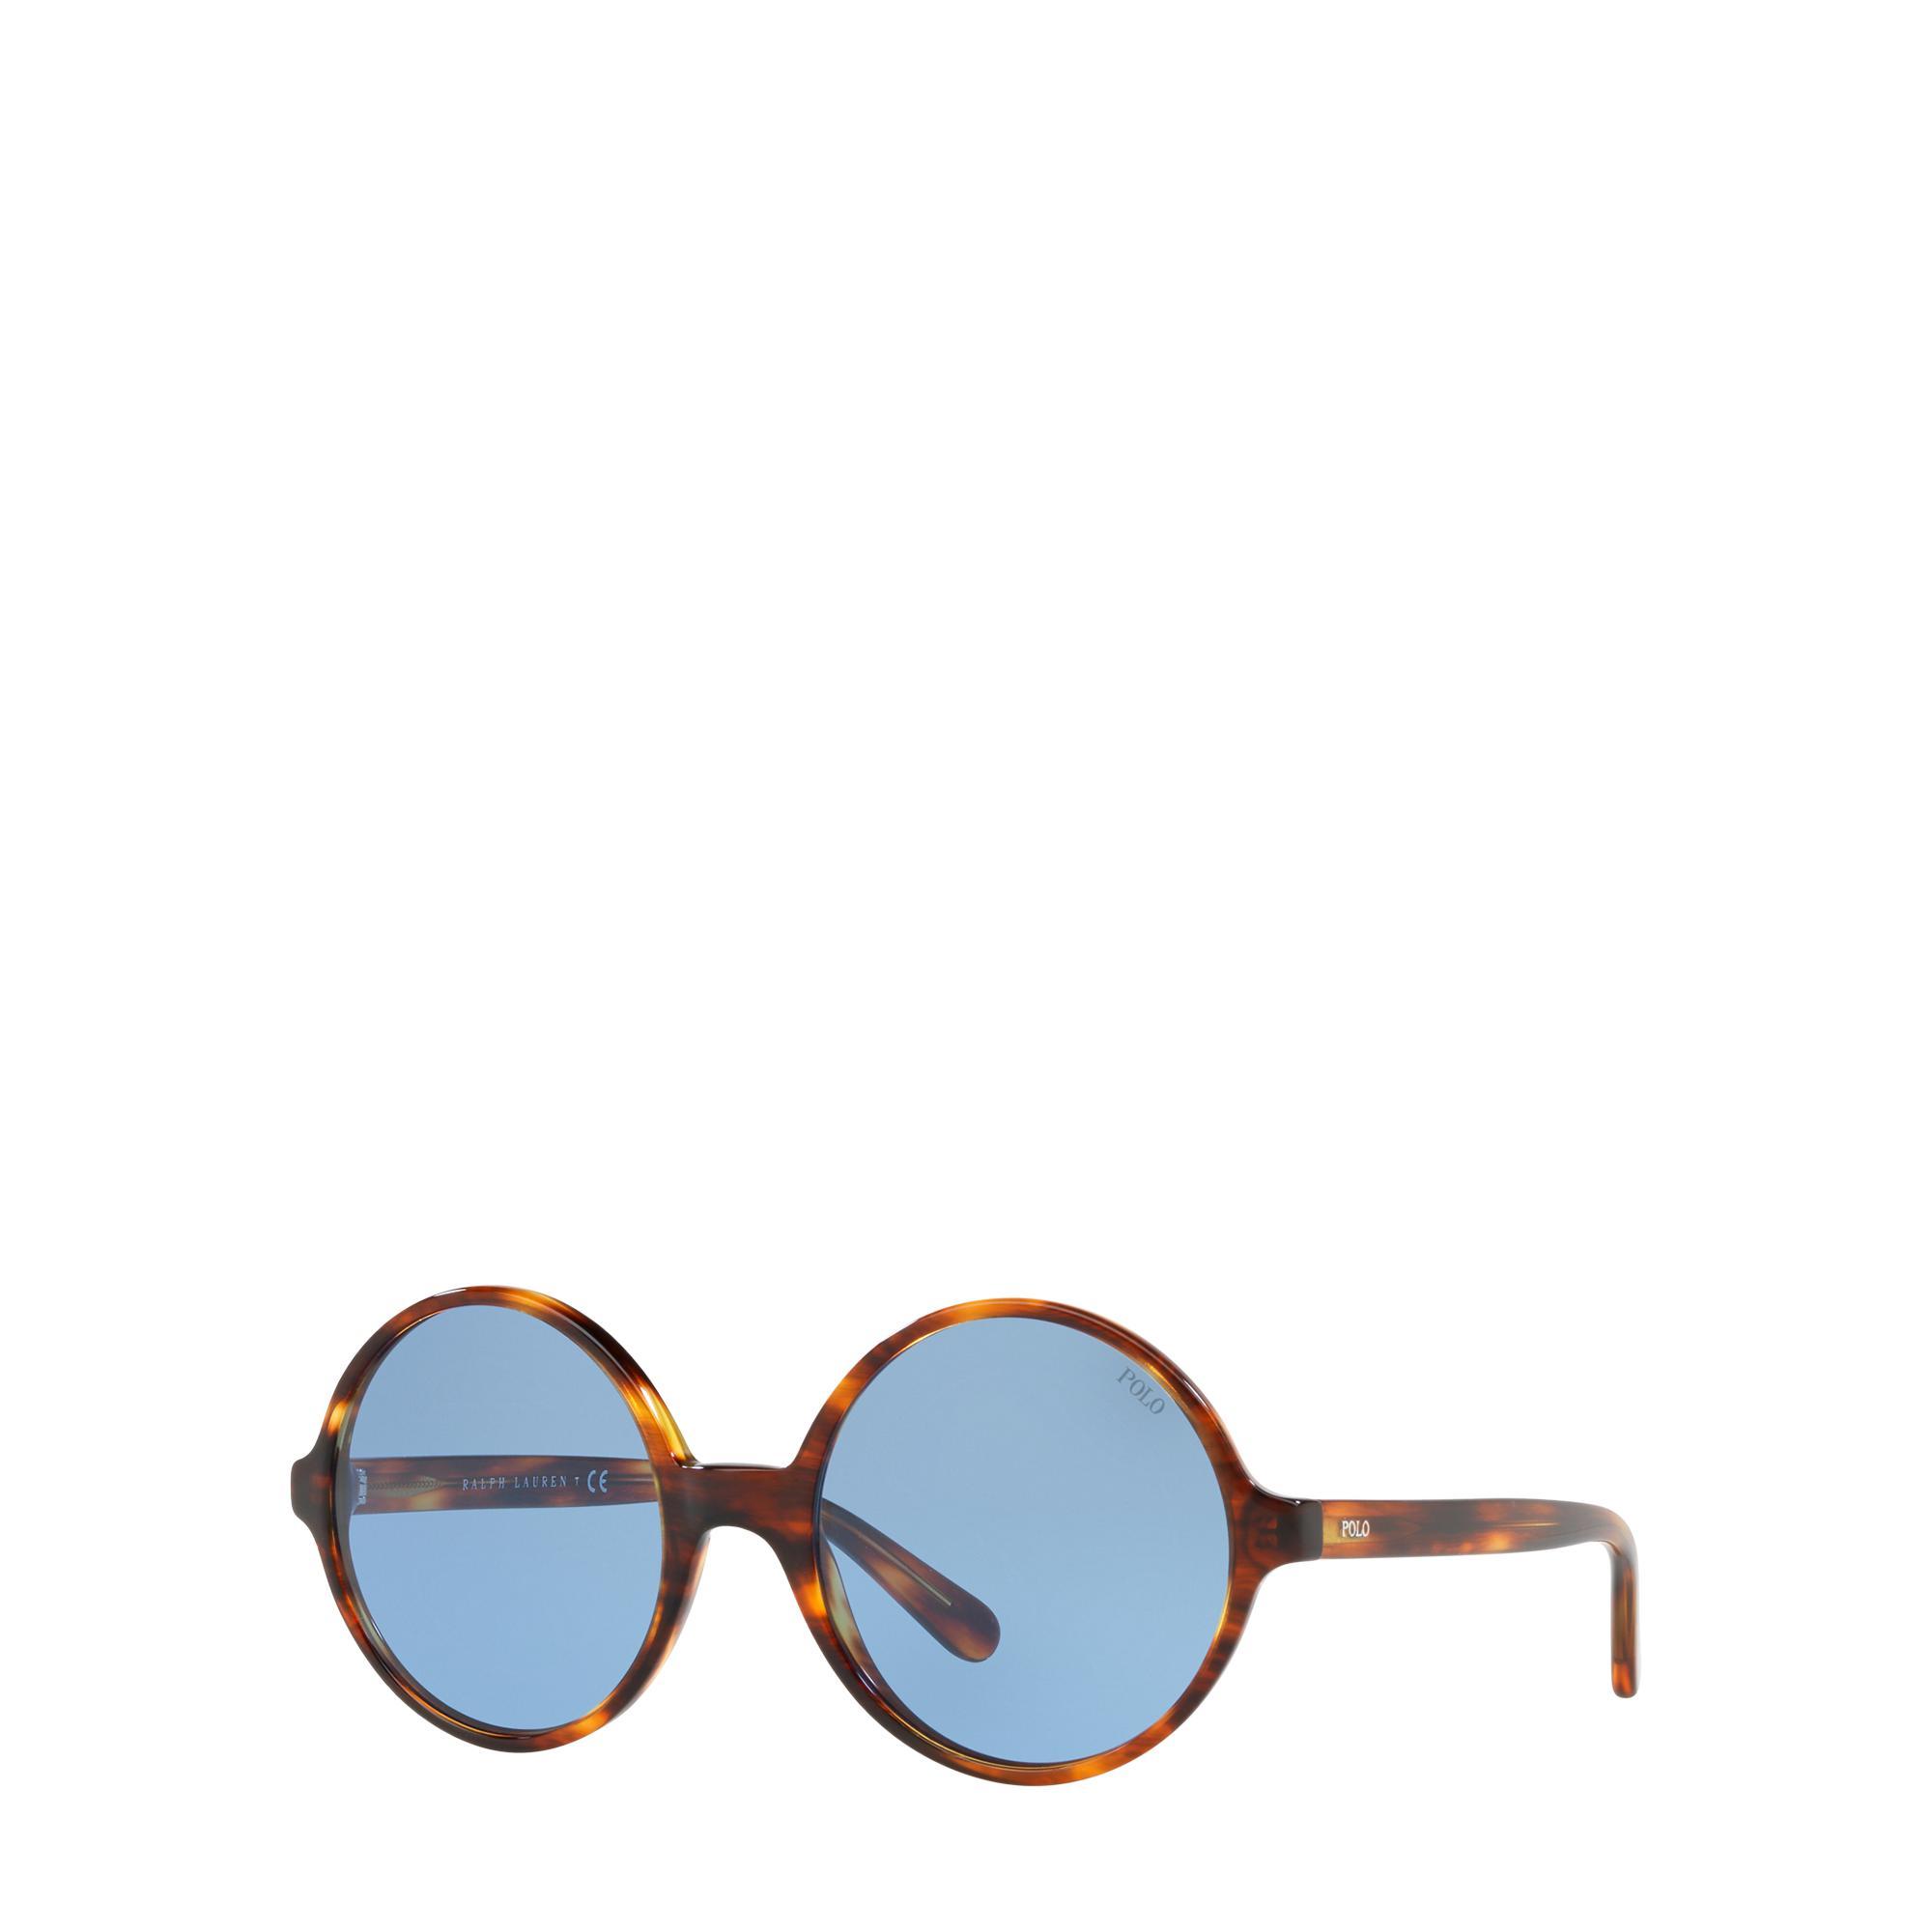 319cc45aff1 Lyst - Polo Ralph Lauren Oversize Round Sunglasses in Blue